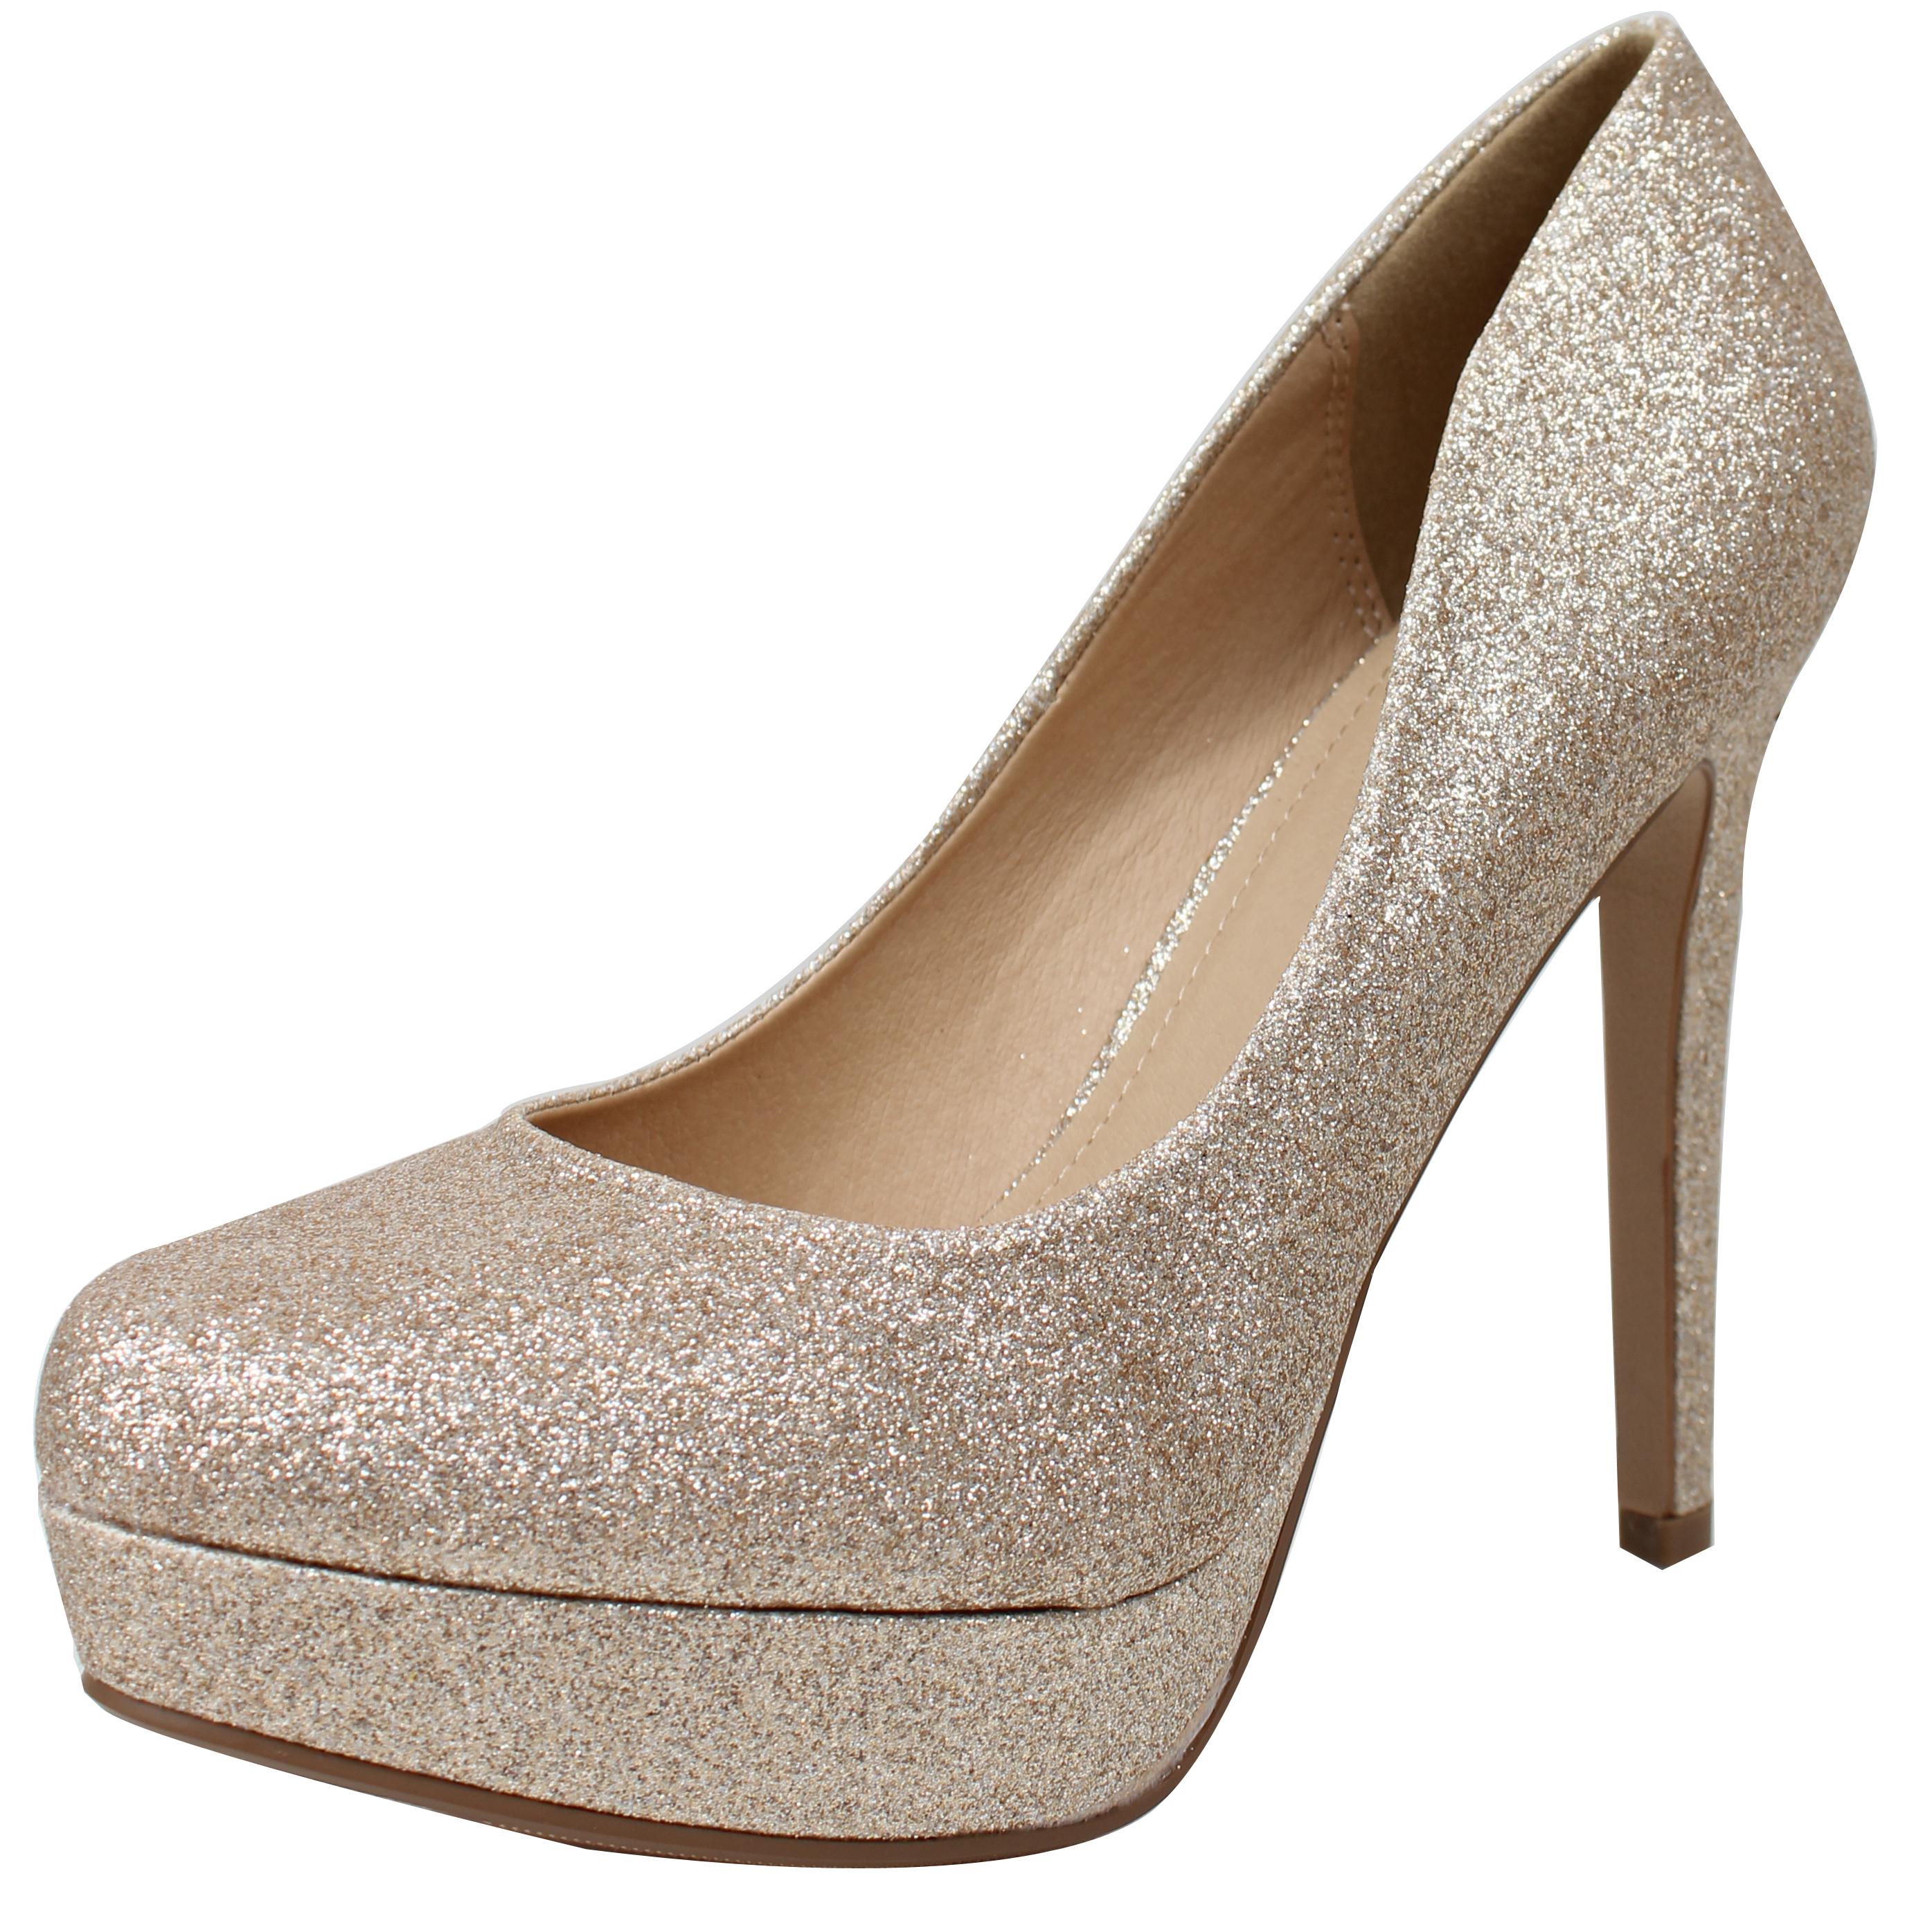 Delicious Women's Almond Shape Toe Platform Stiletto High Heel Pump